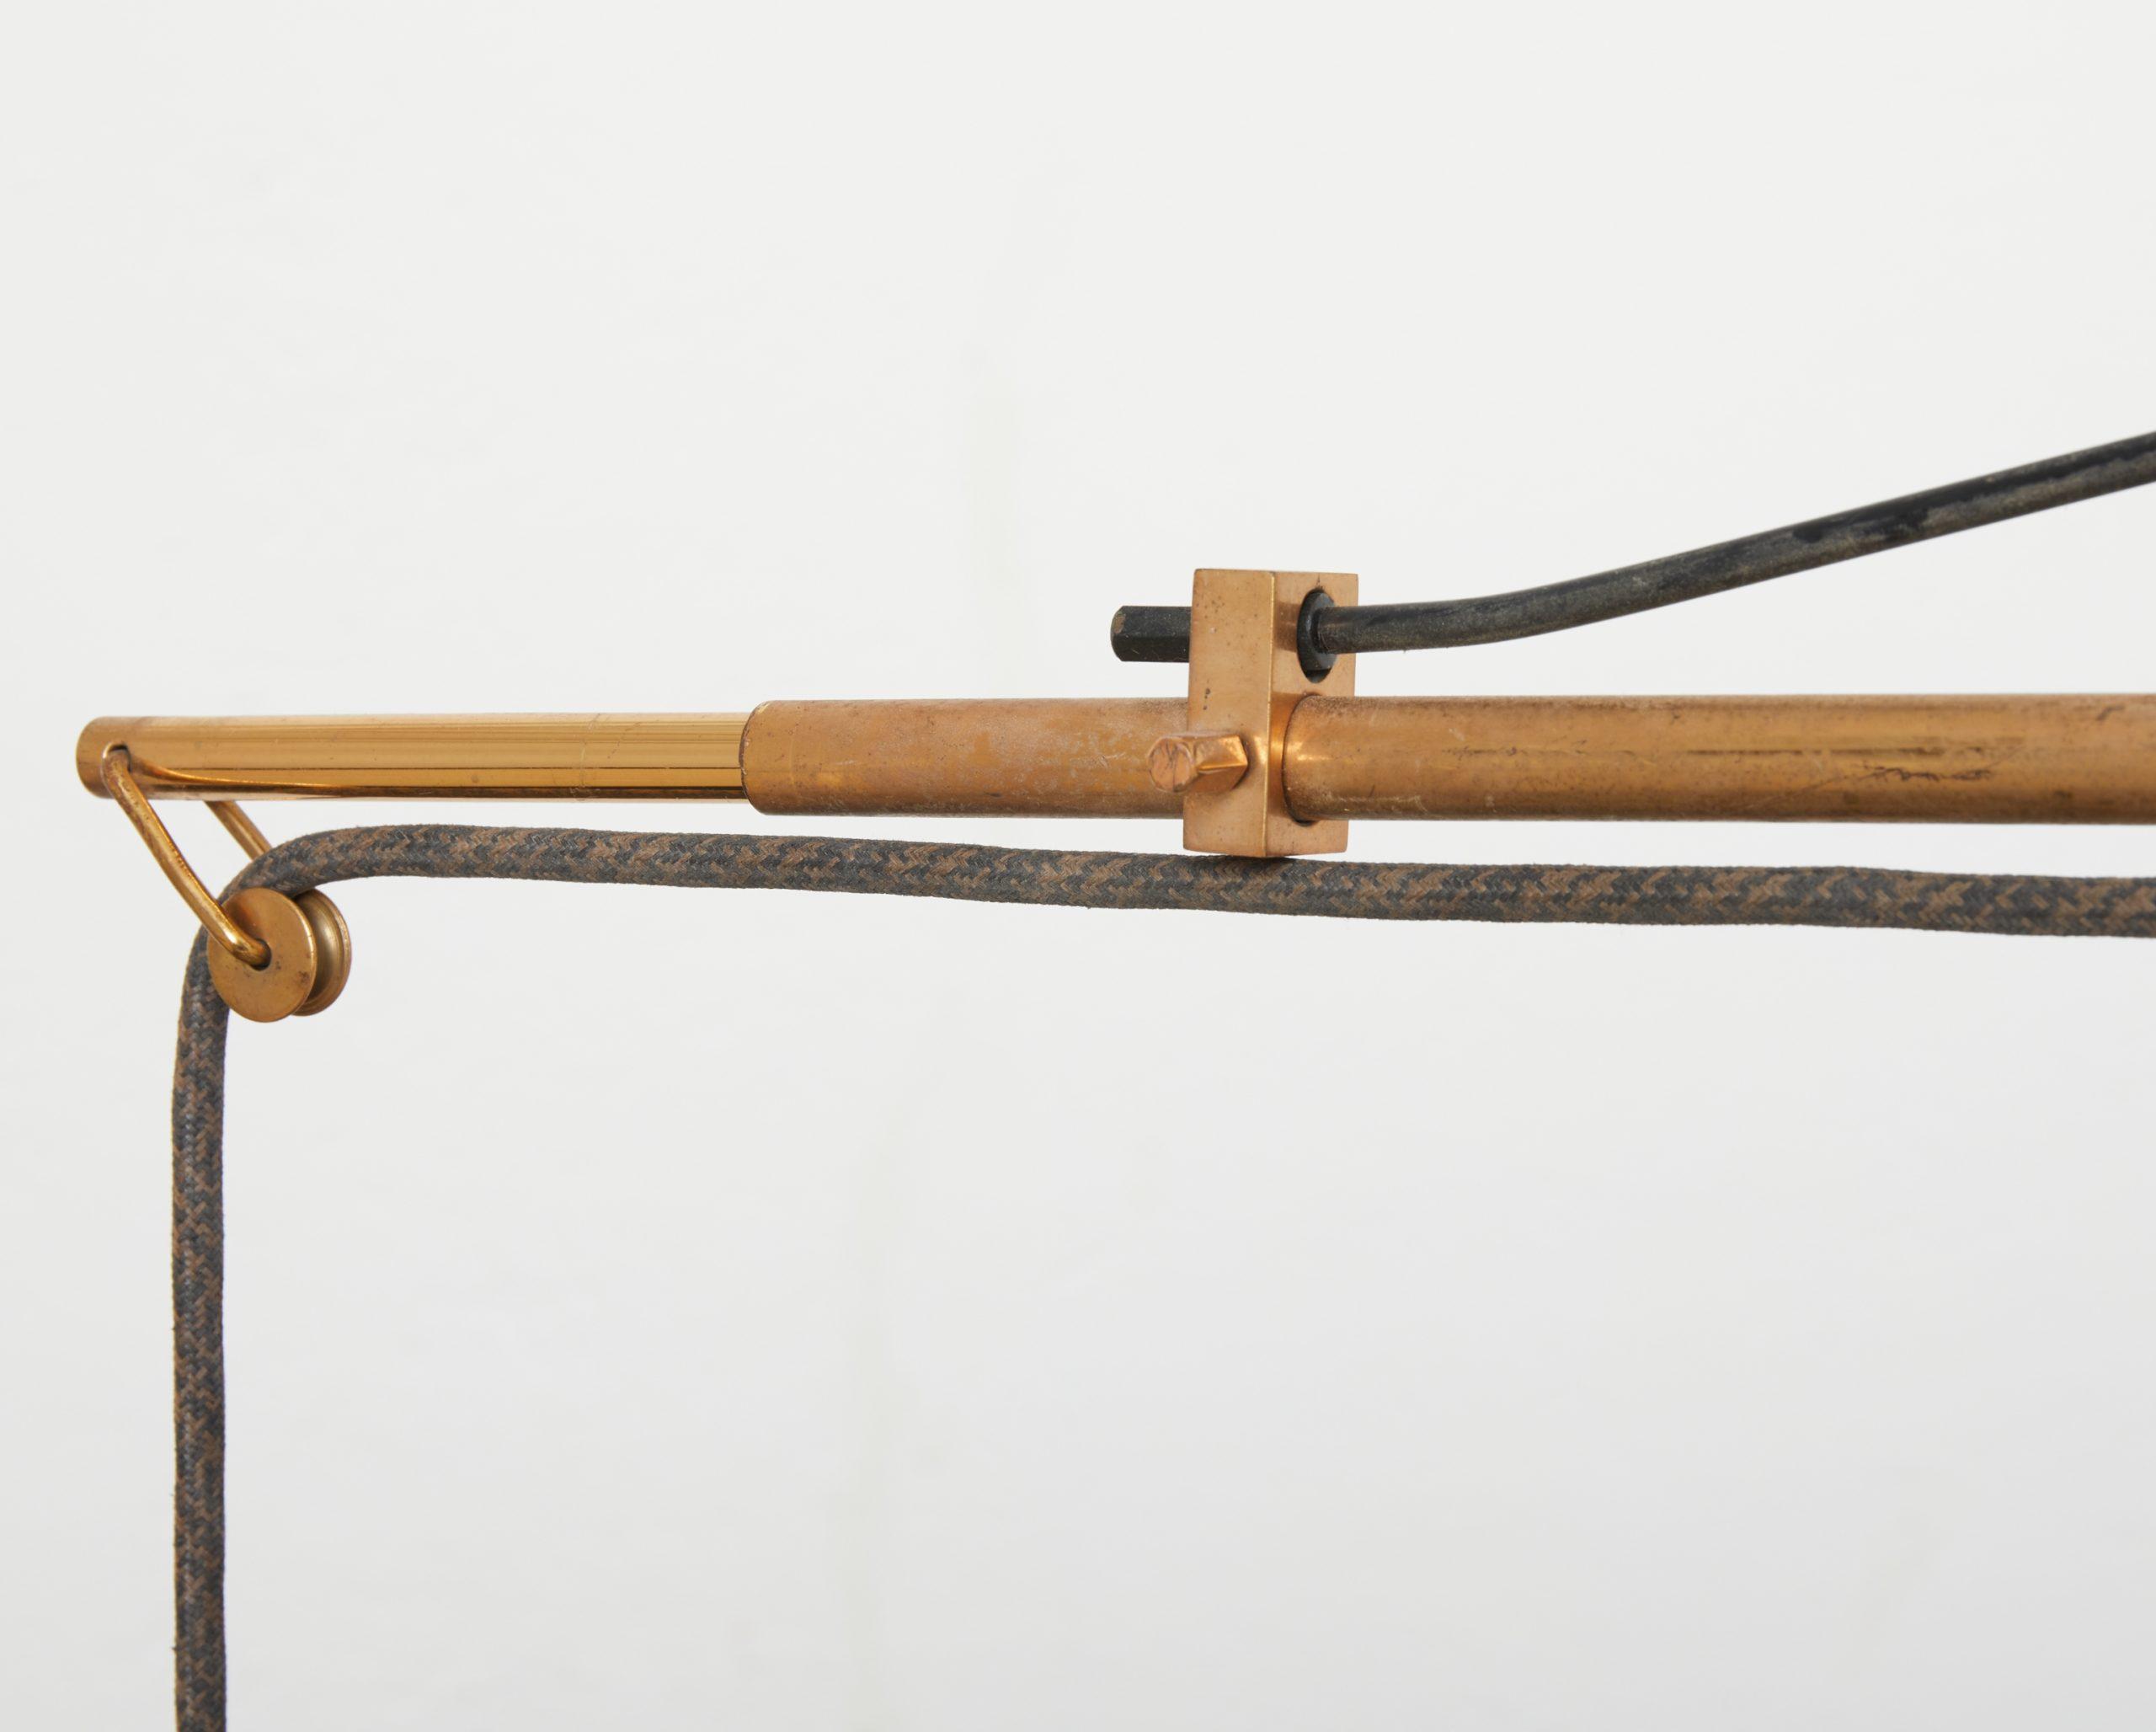 brass-wall-lamp-model-2061-by-gaetano-scolari-for-stilnovo-1954-image-02